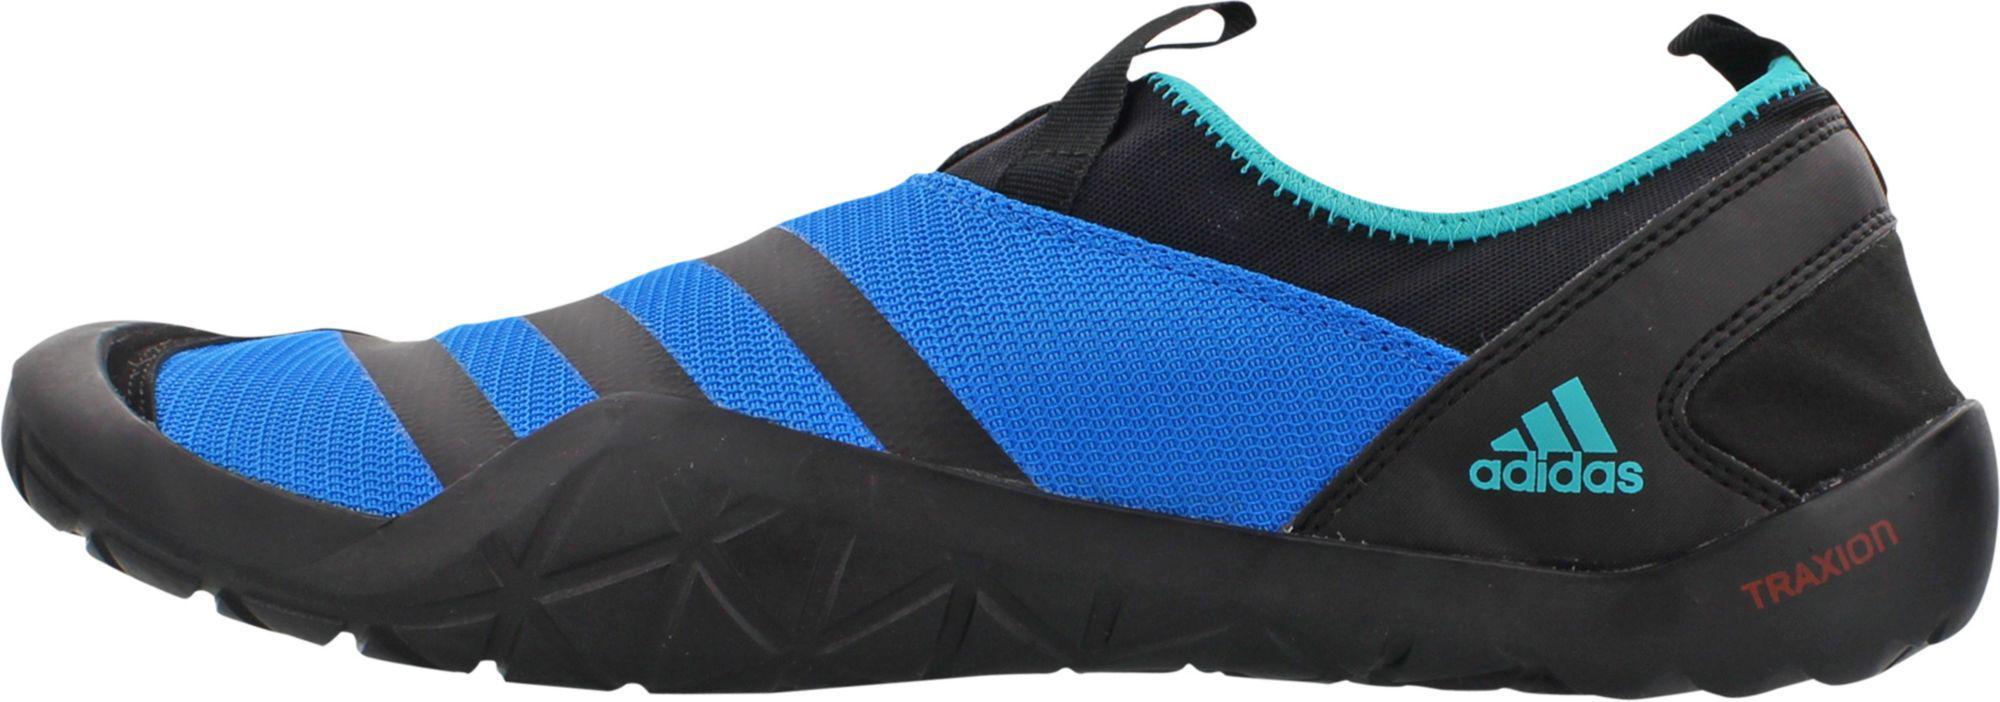 lyst adidas outdoor climacool jawpaw scivolare in acqua le scarpe blu.